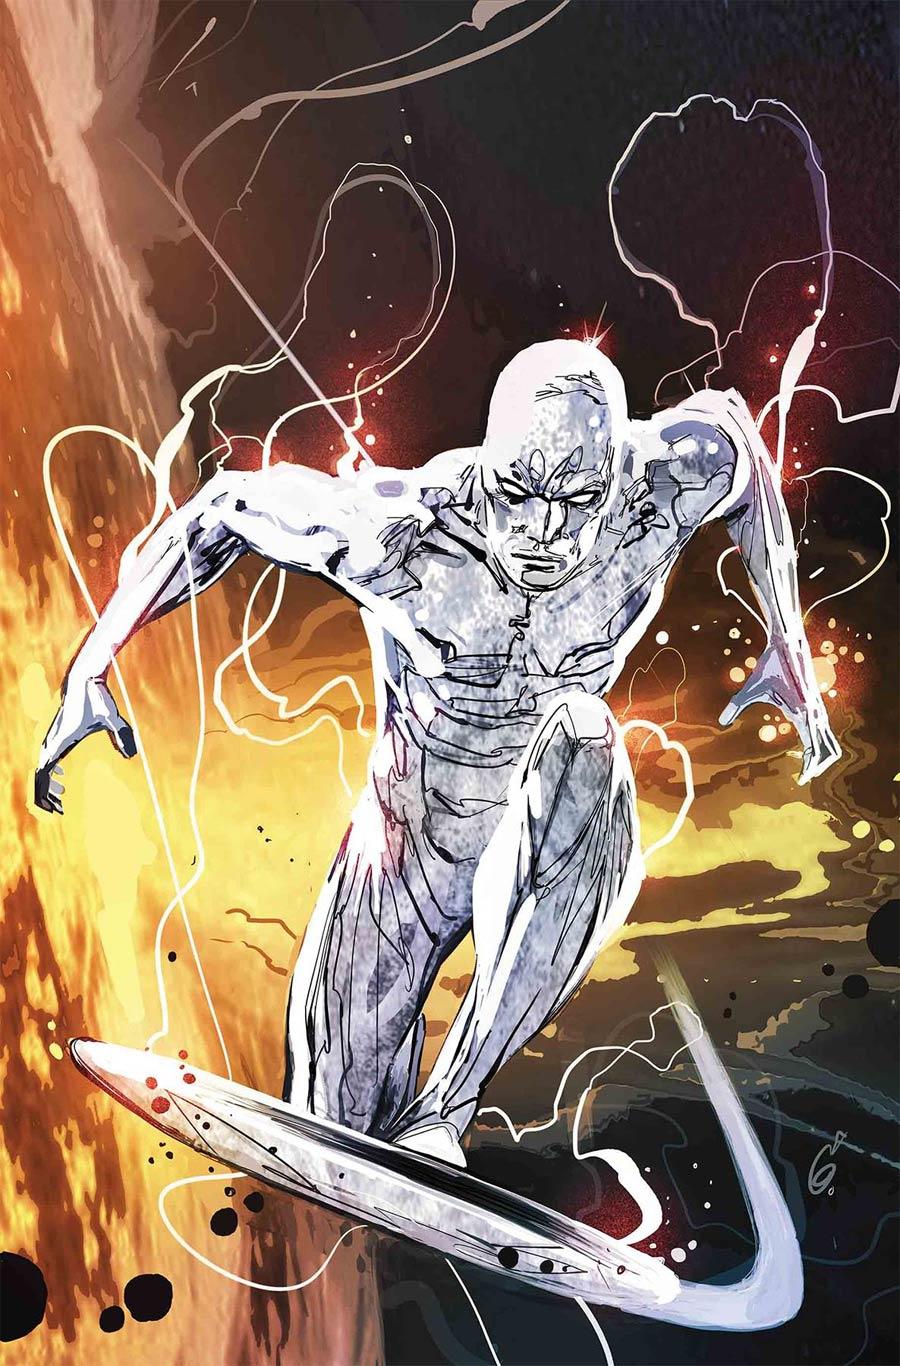 Defenders Silver Surfer #1 Cover A Regular Ron Garney Cover (Best Defense Part 4)